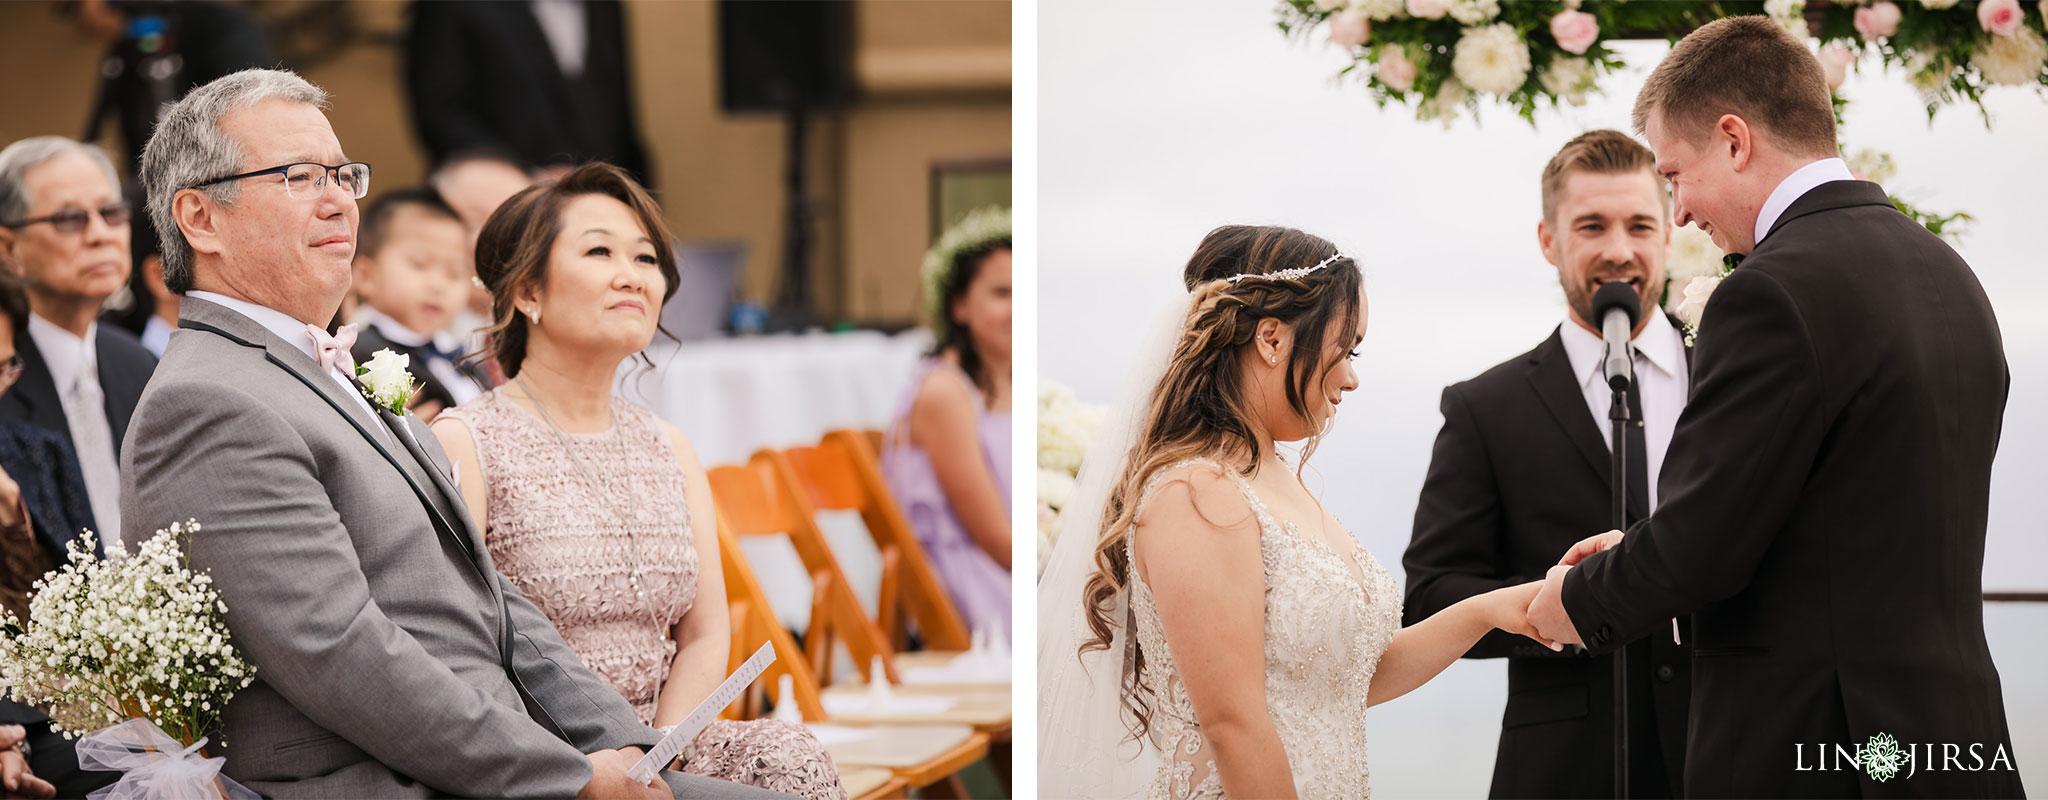 19 surf and sand resort laguna beach wedding ceremony photography